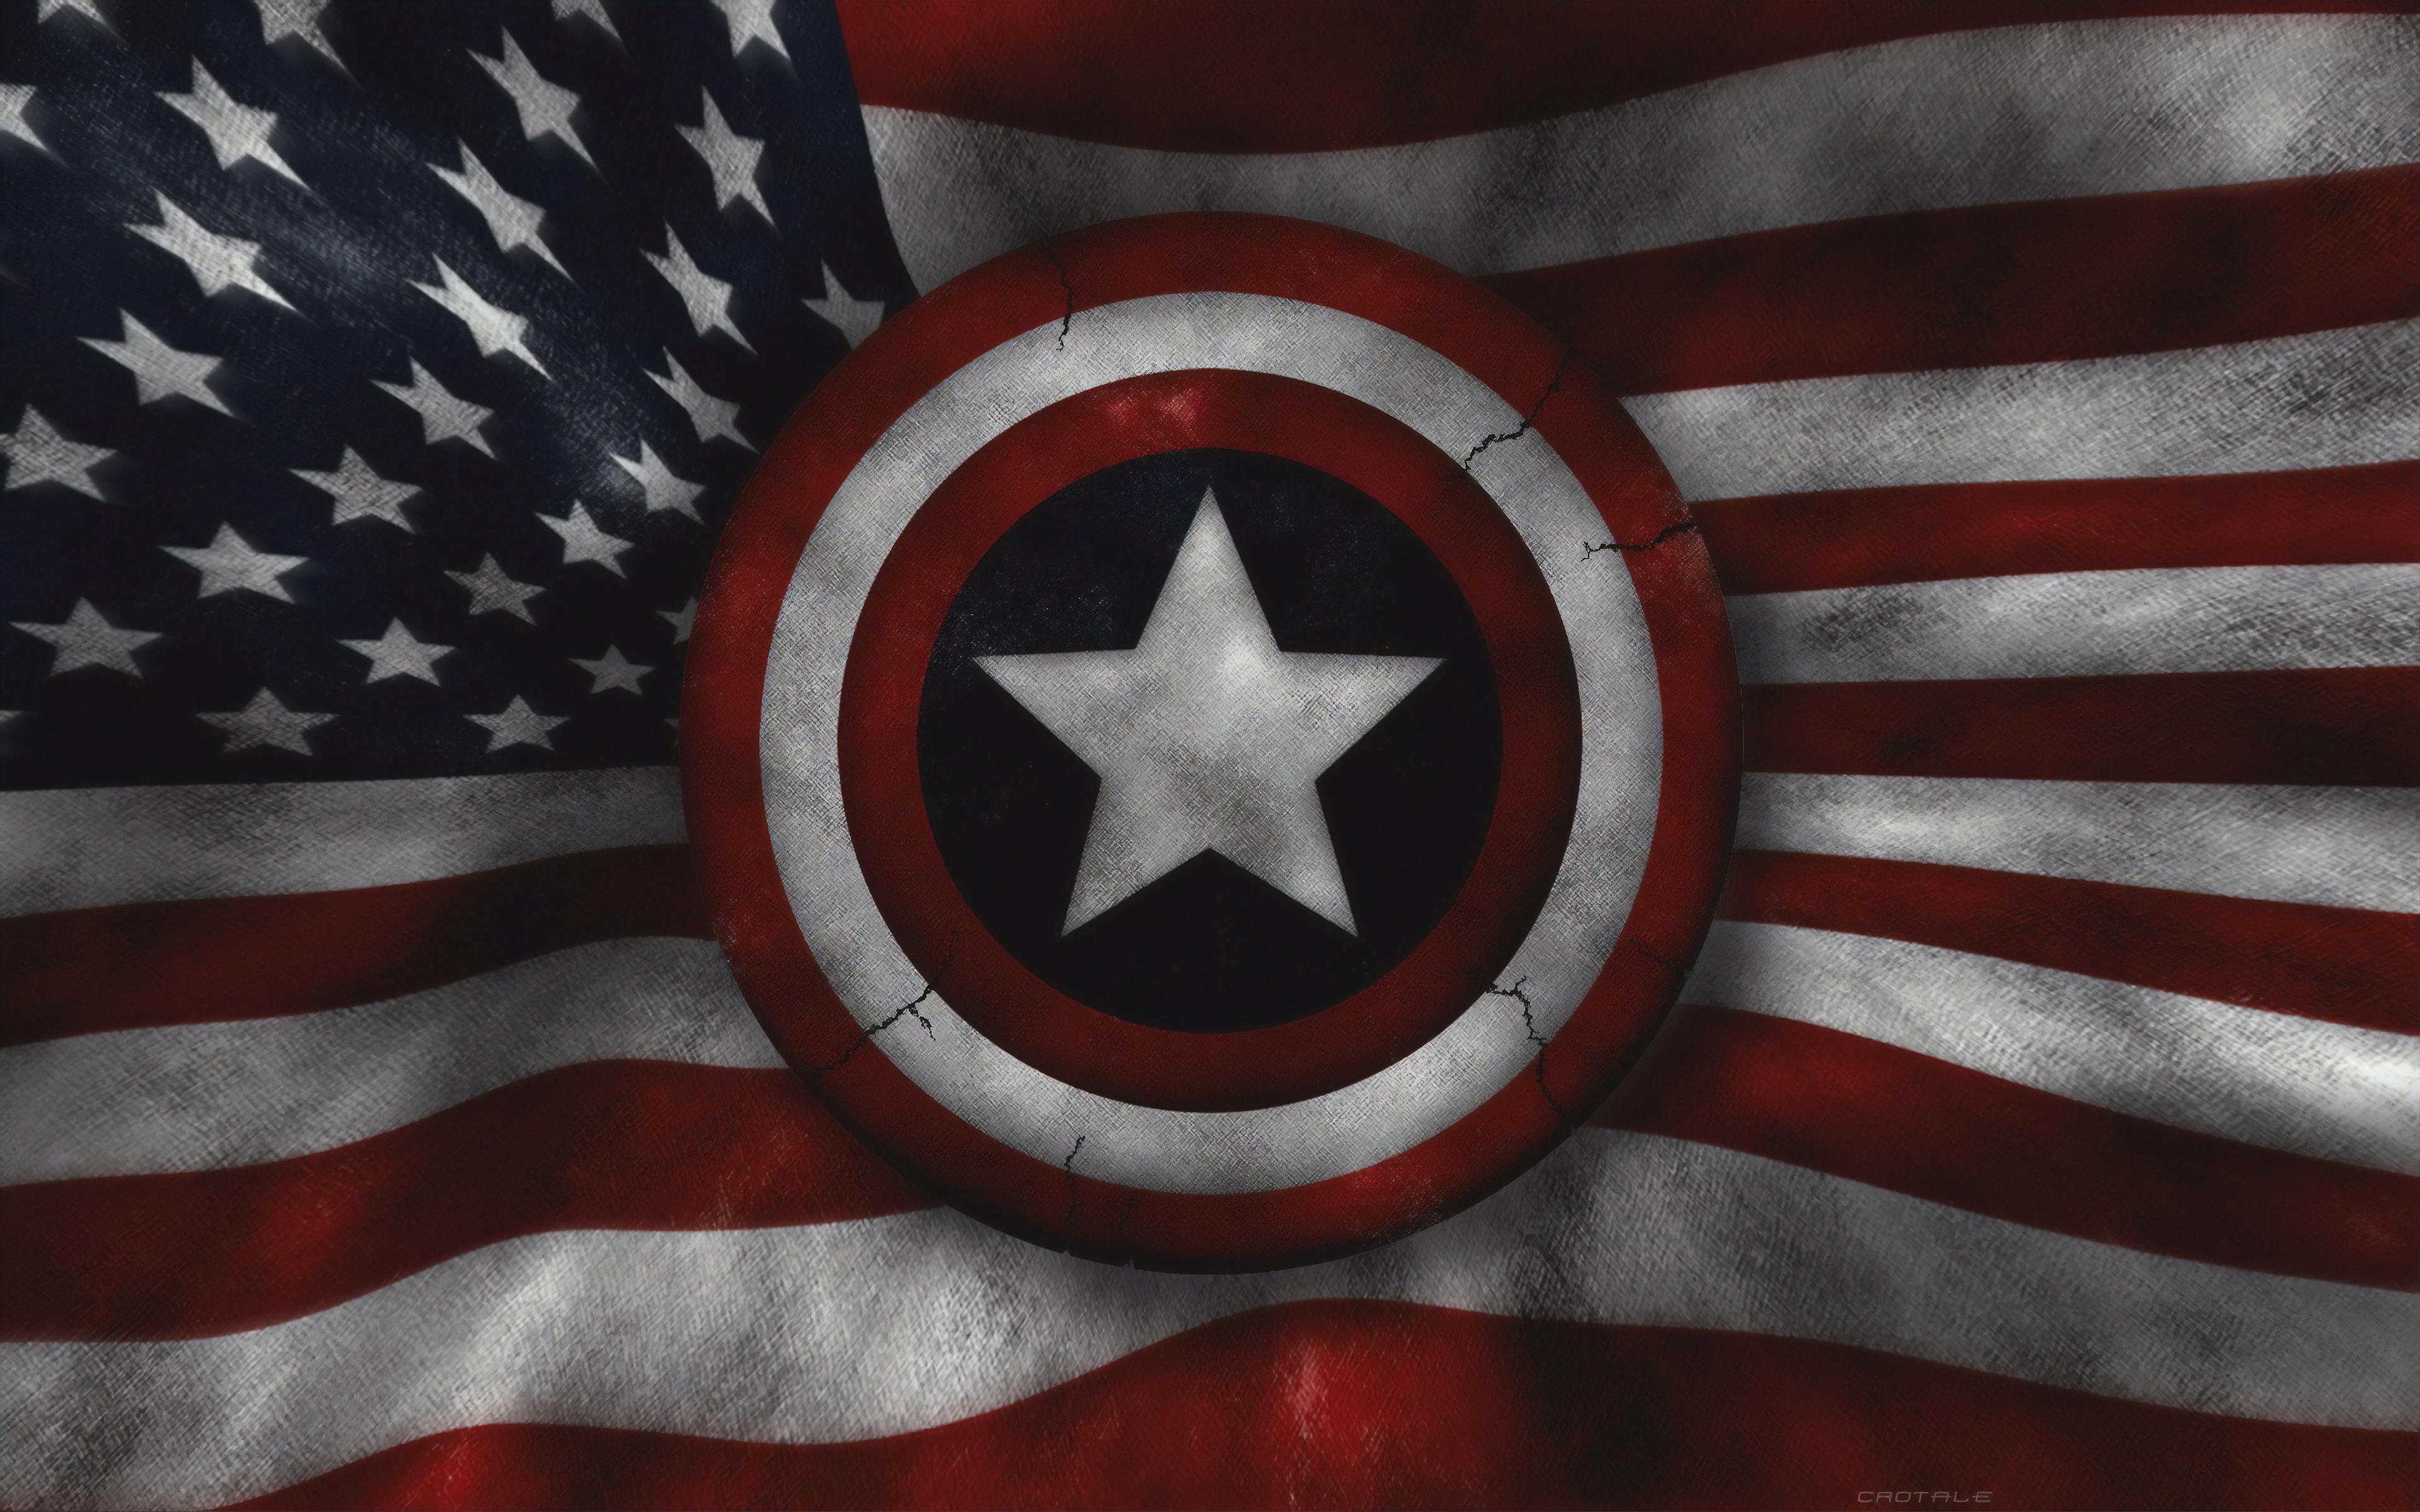 Captain America Us Flag 4k Hd Superheroes 4k Wallpapers Images